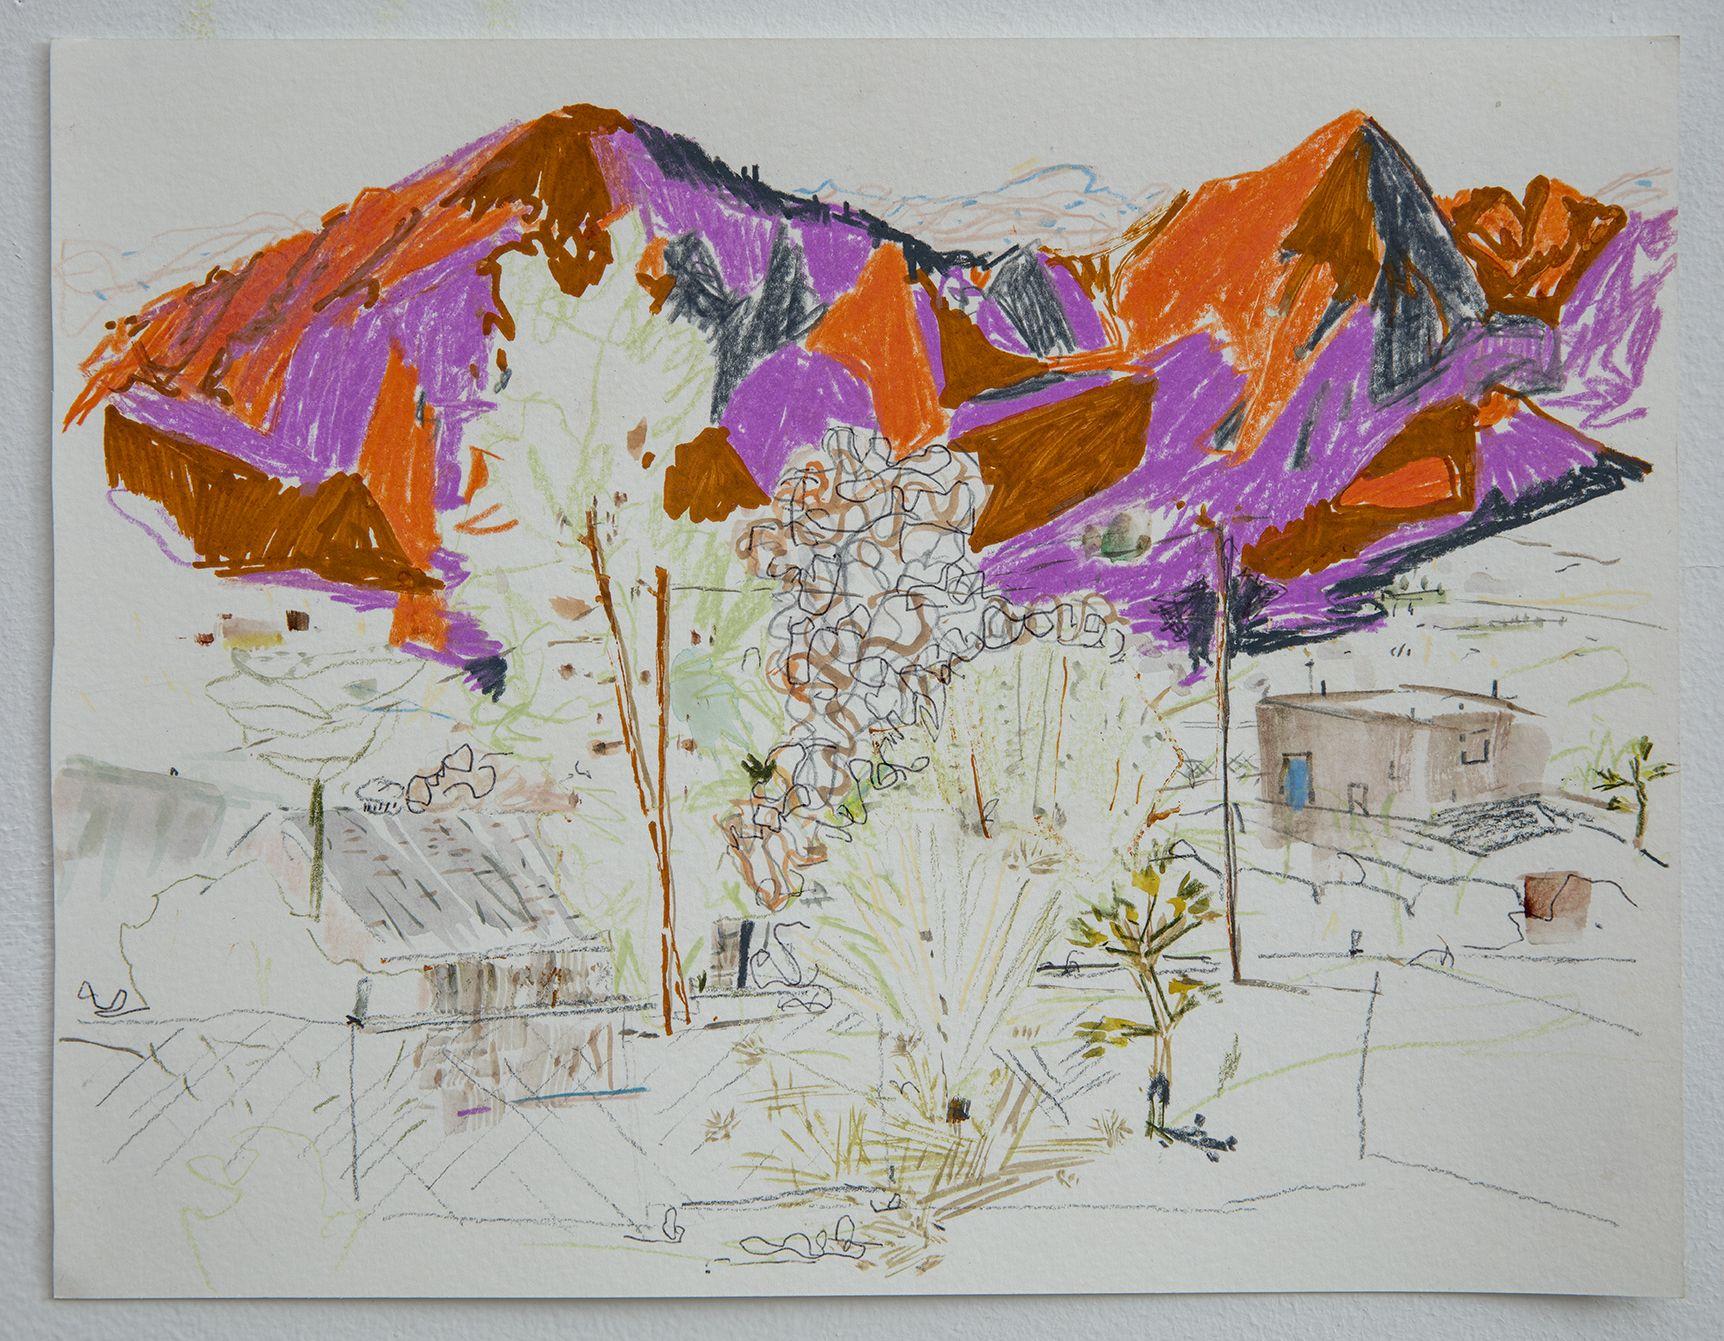 LISA SANDITZ, Mountain 3, 2016